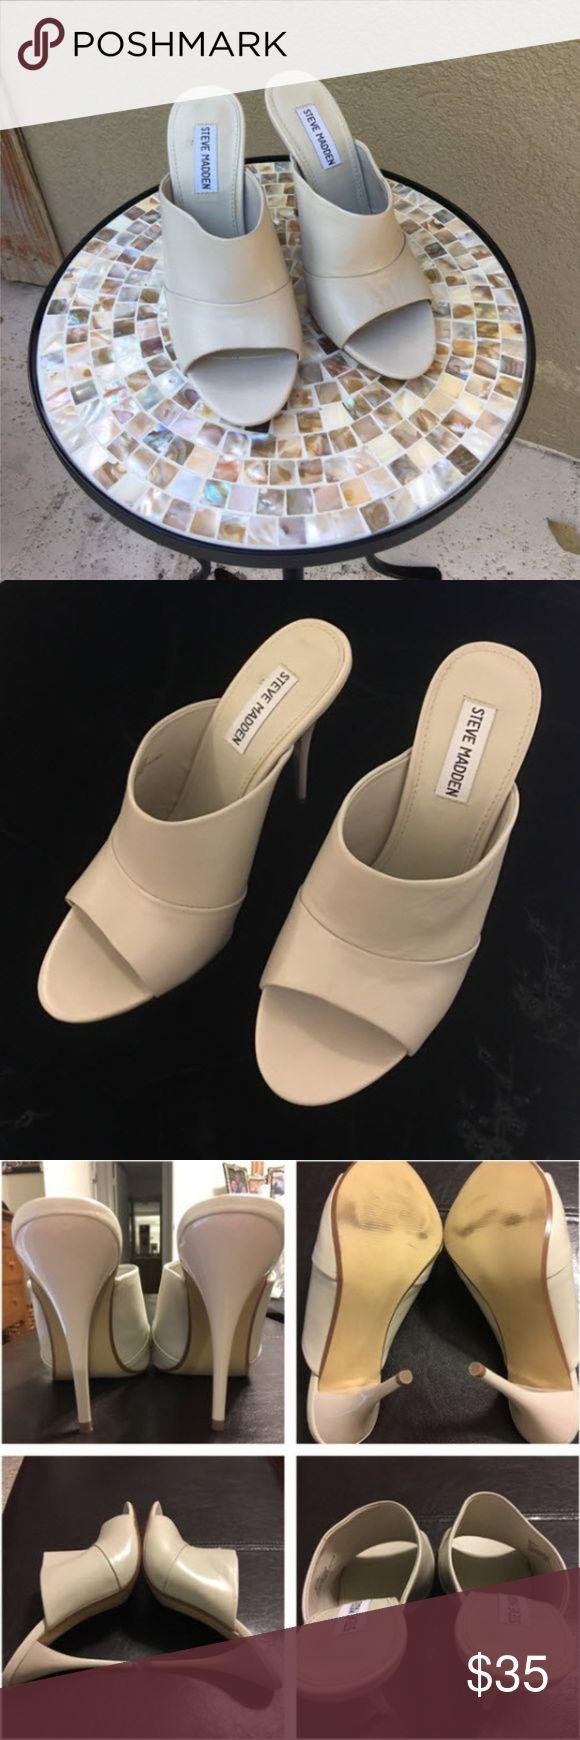 Steve Madden heels in bone color